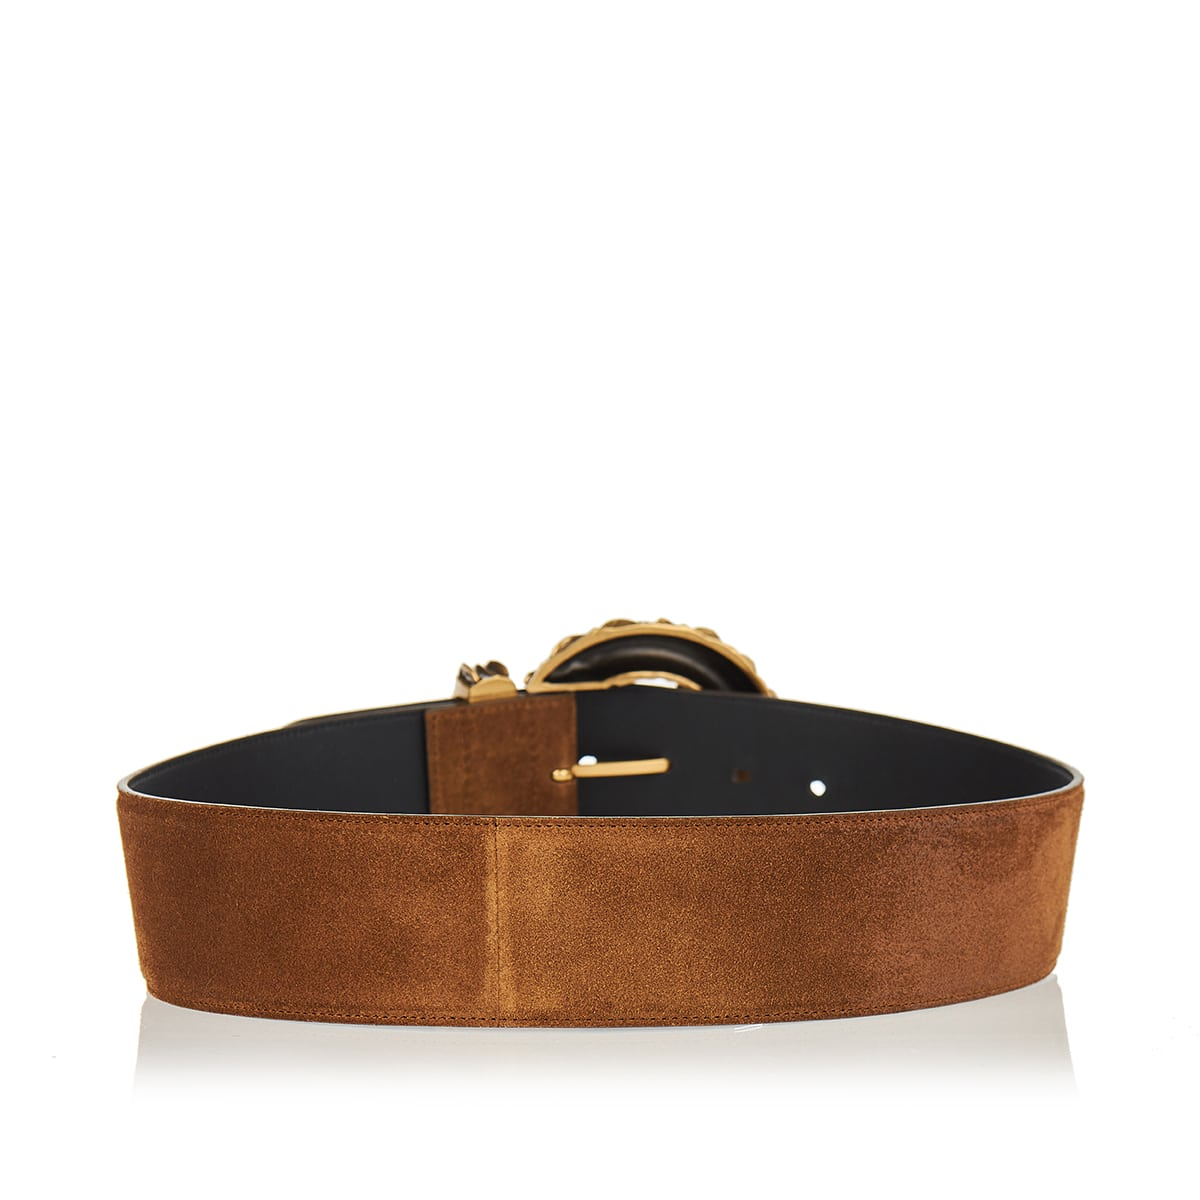 Jeweled-buckle wide suede belt